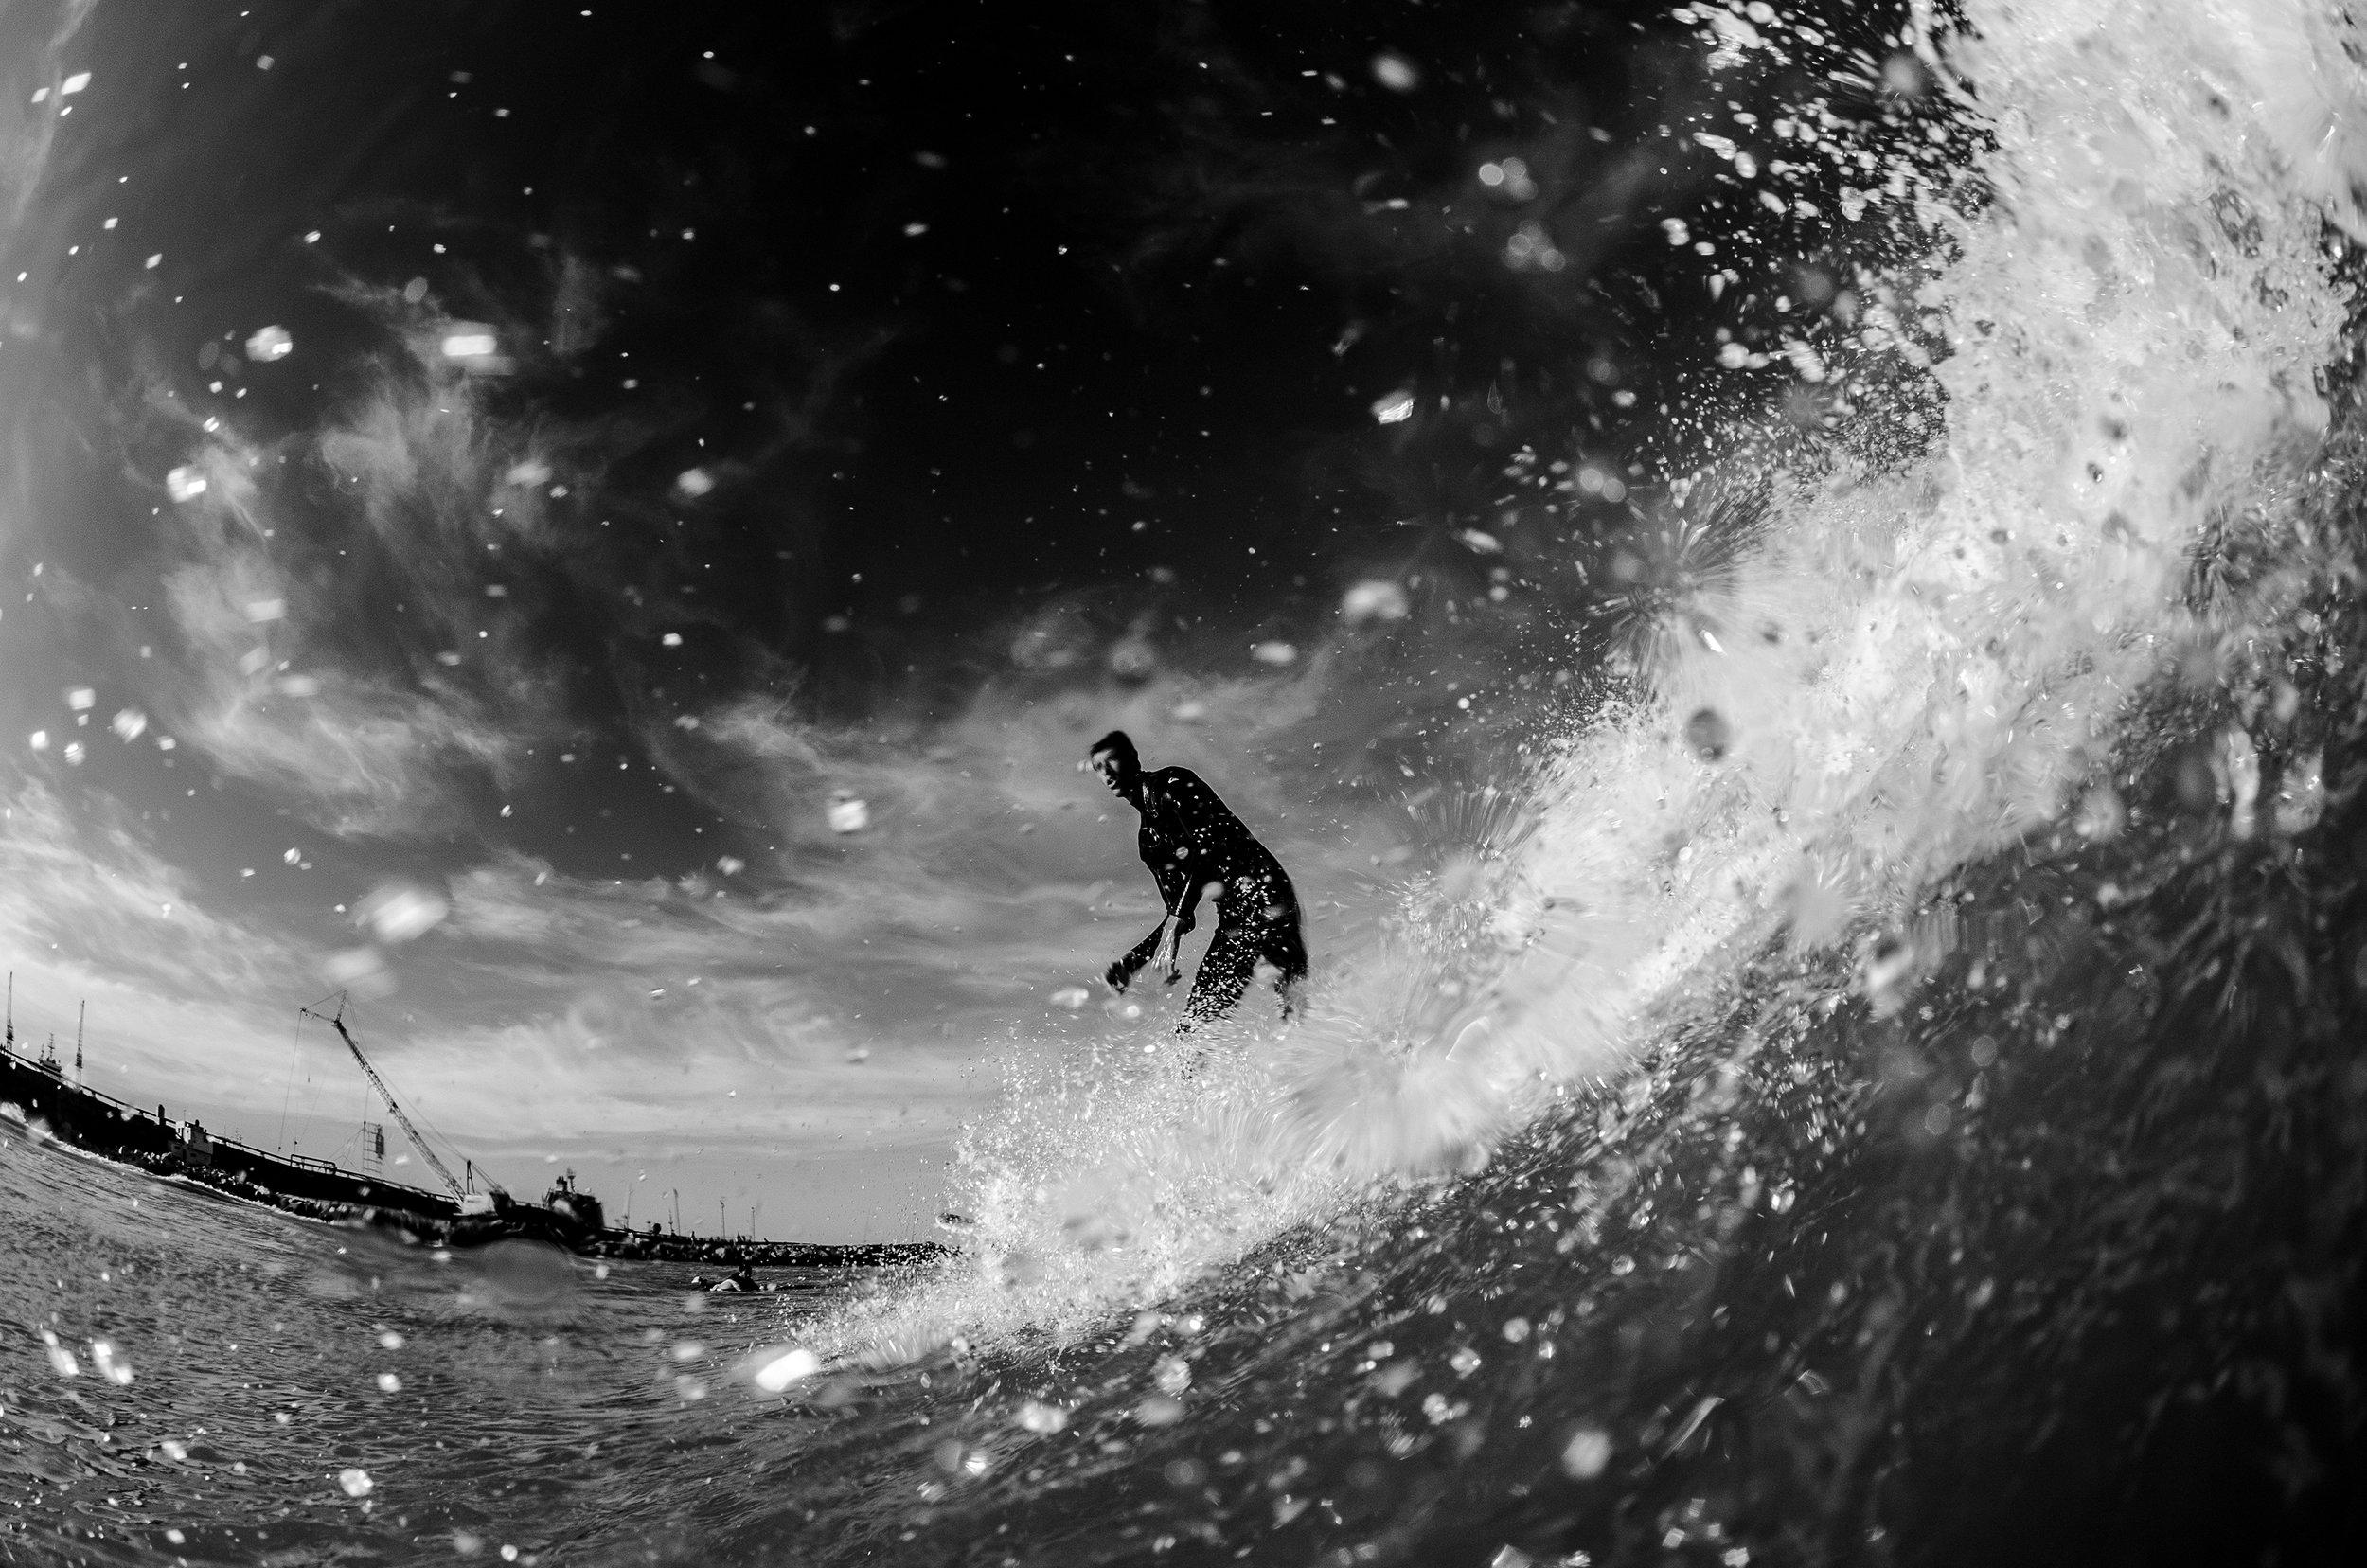 Canva - Man Surfing.jpg